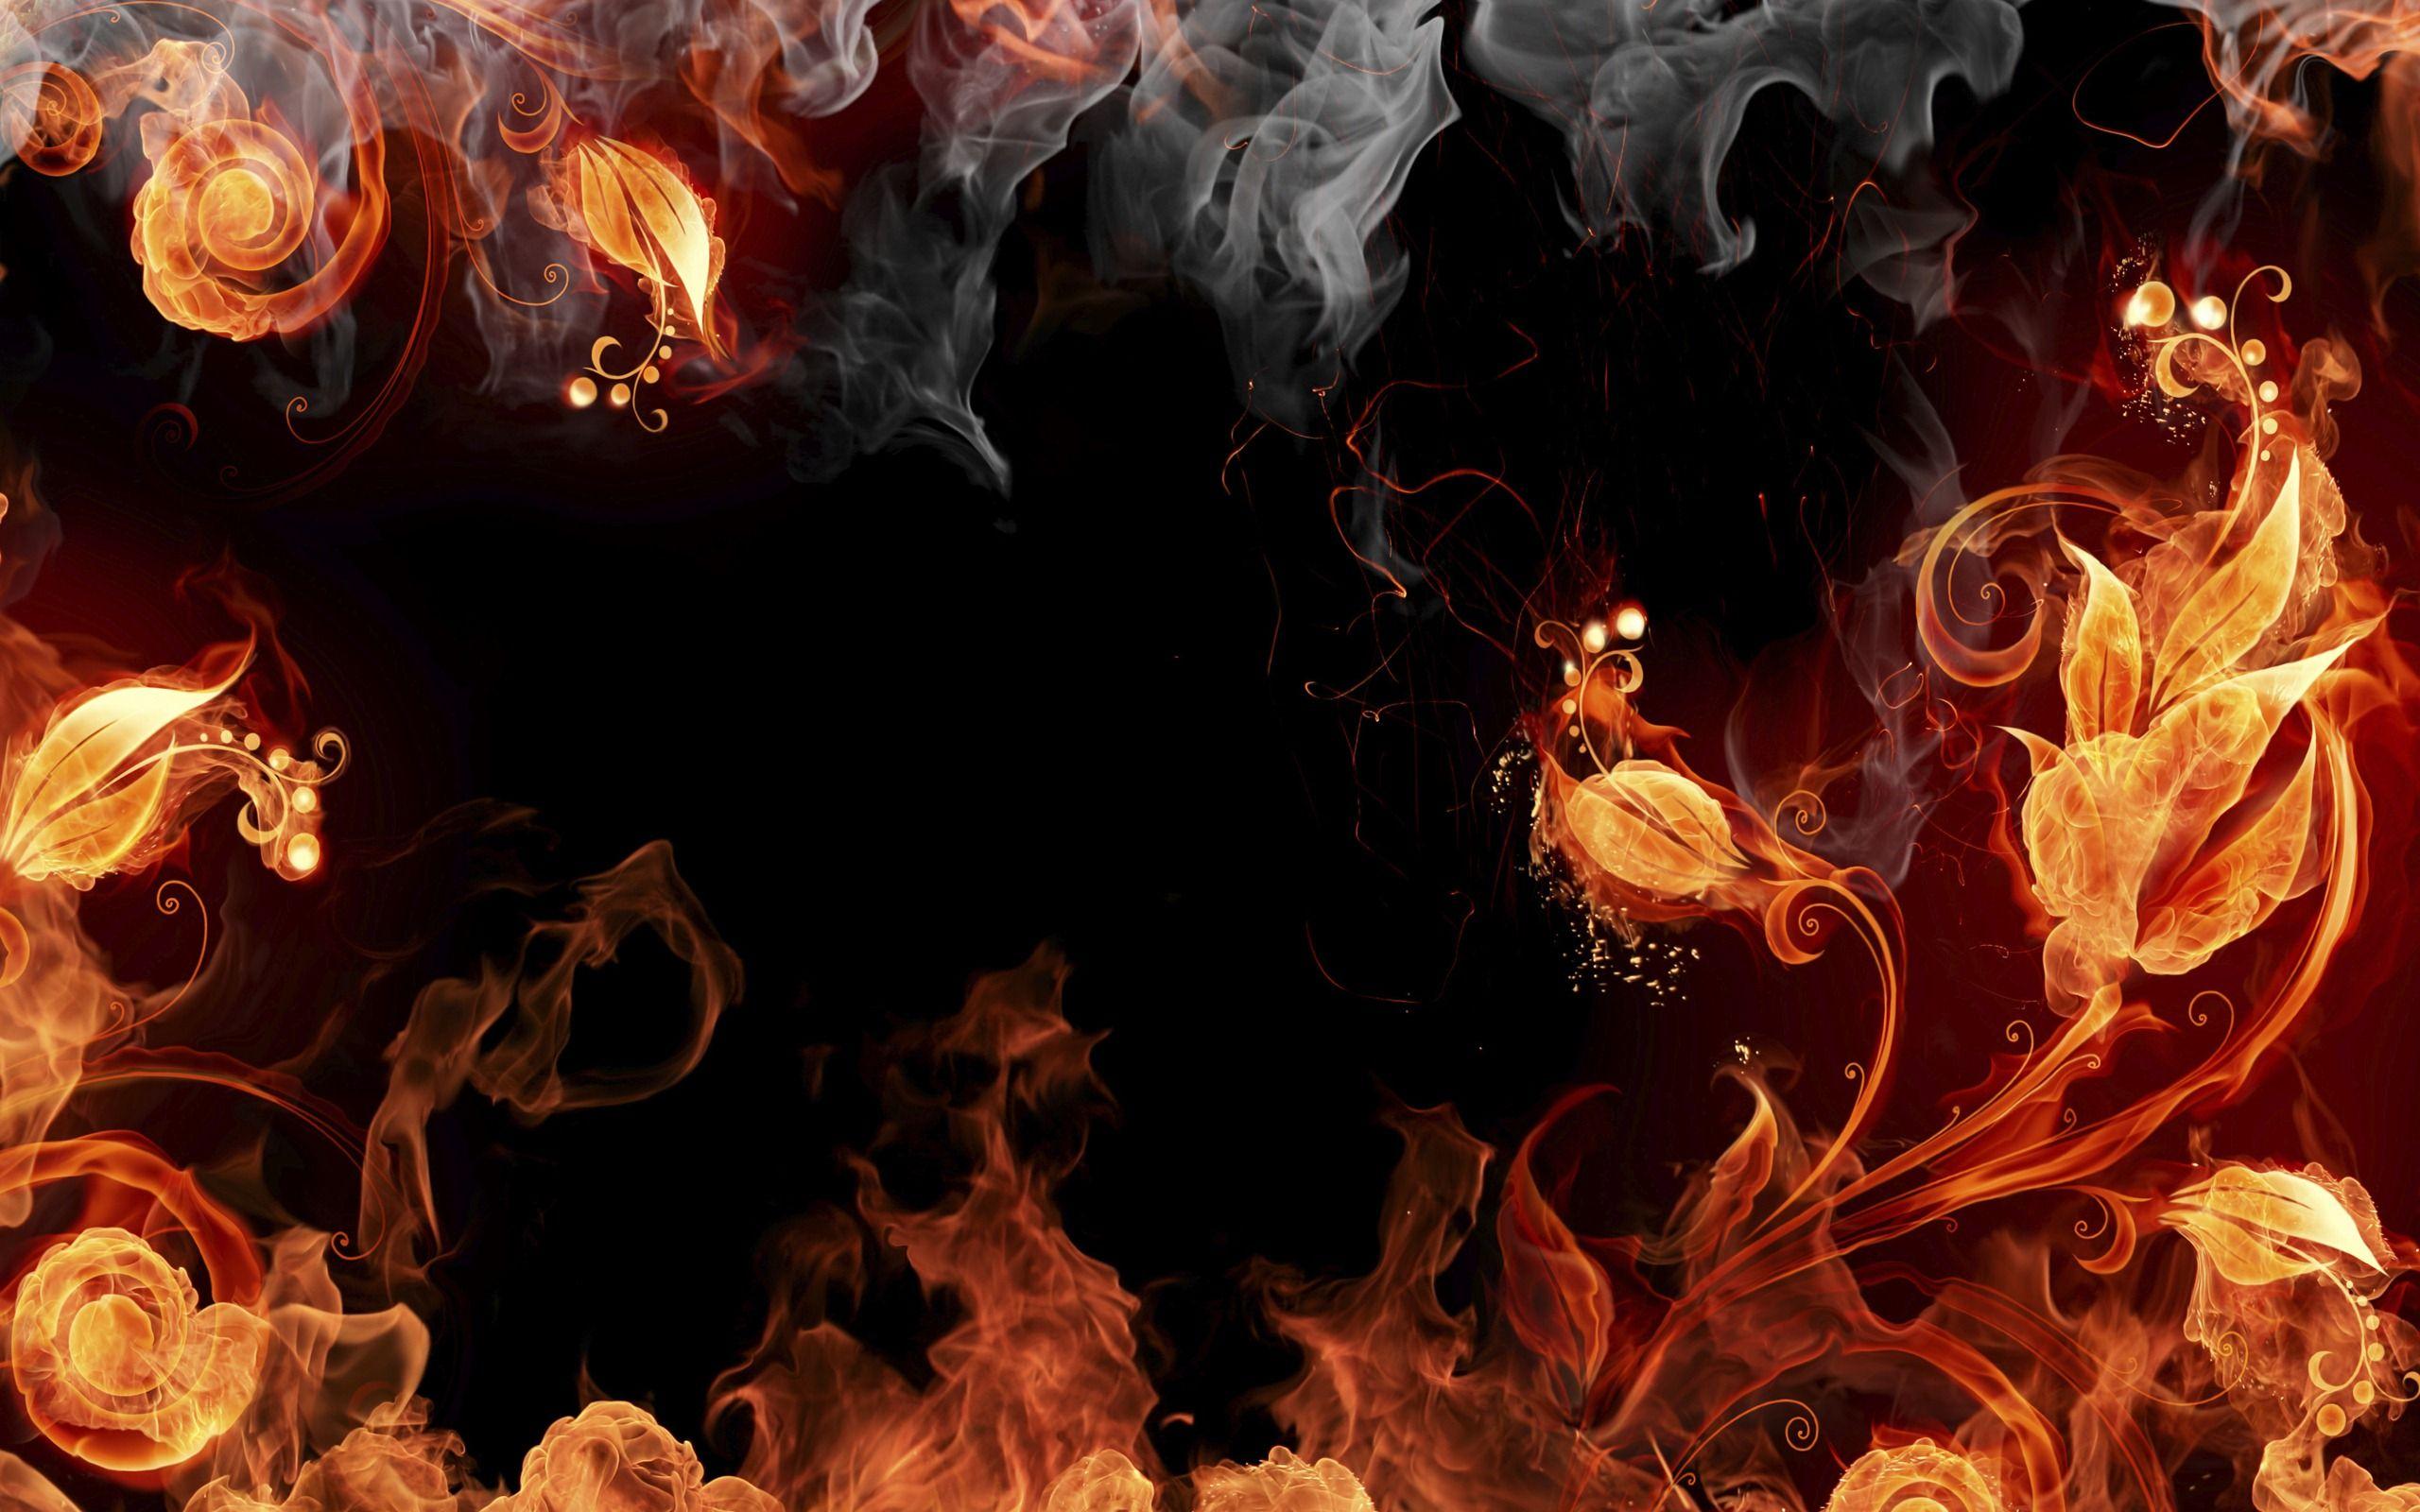 Cool Blazing Fires Smoke Smoke Wallpaper Fire Flower Fire Art